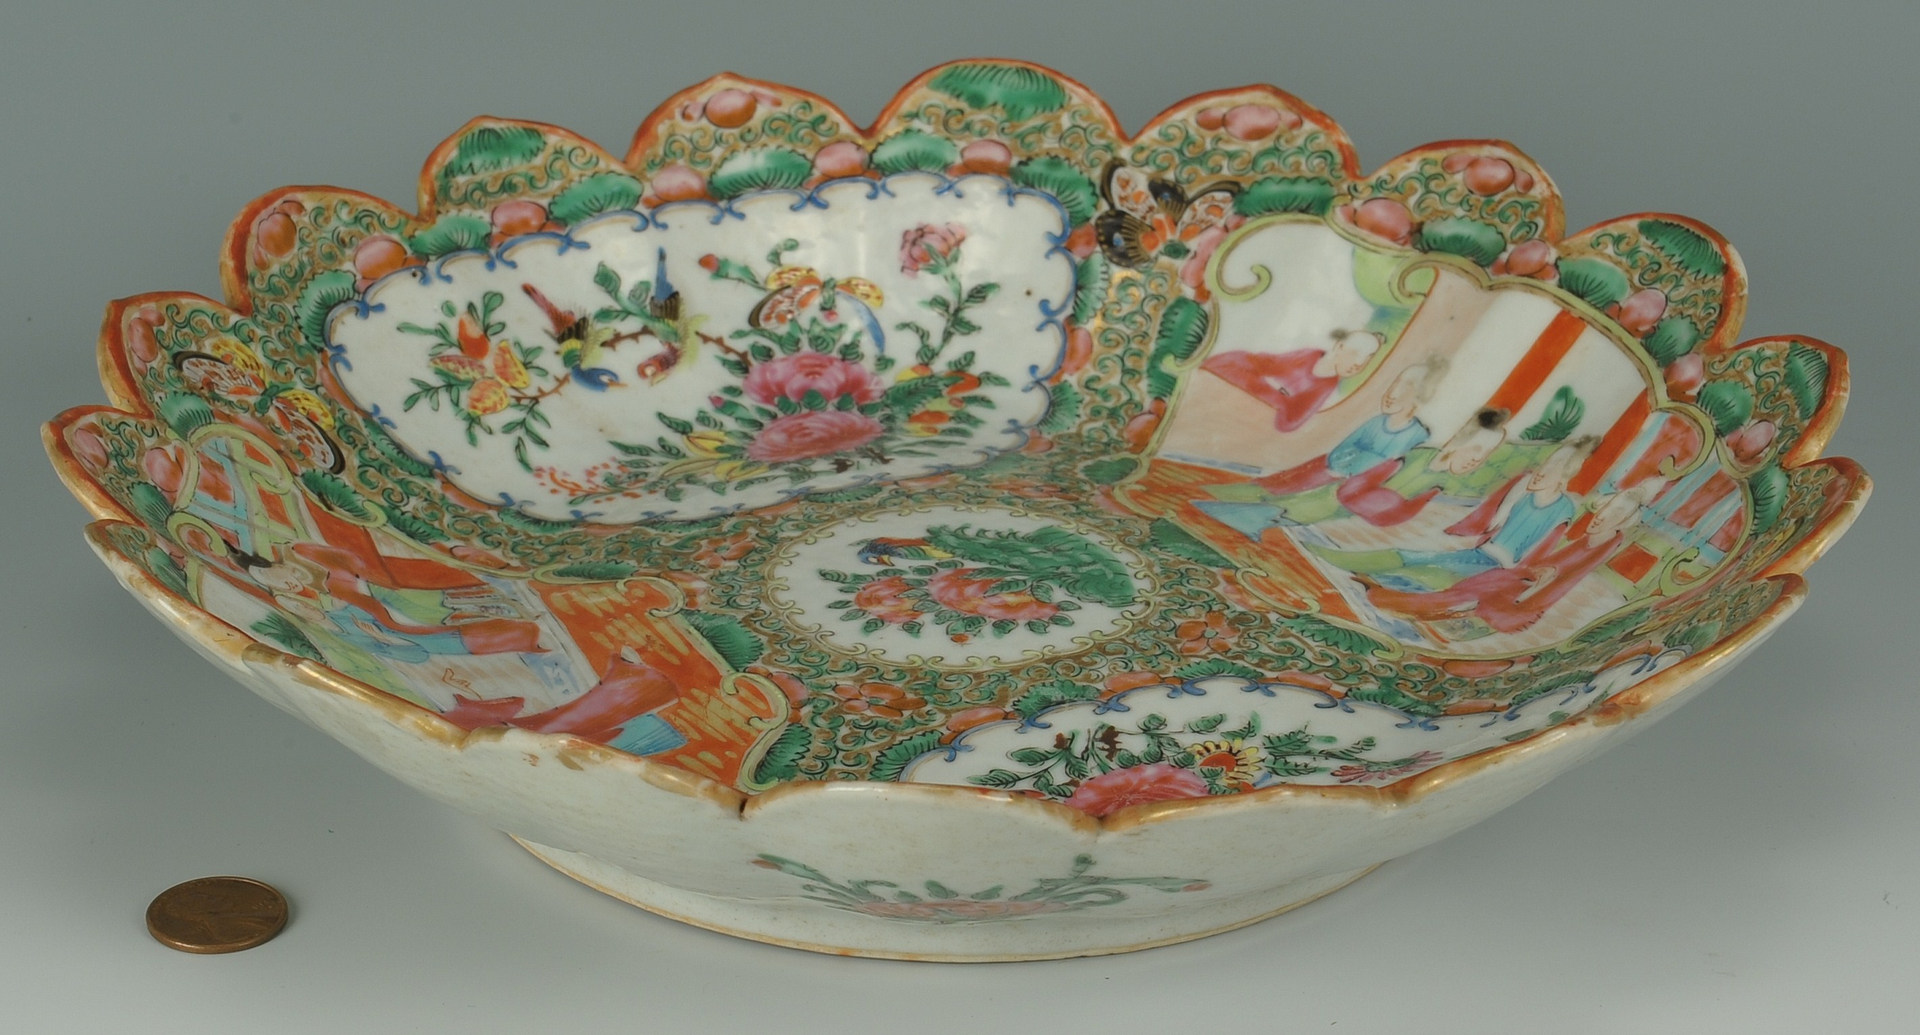 Lot 209: Chinese Rose Medallion Serving Dish